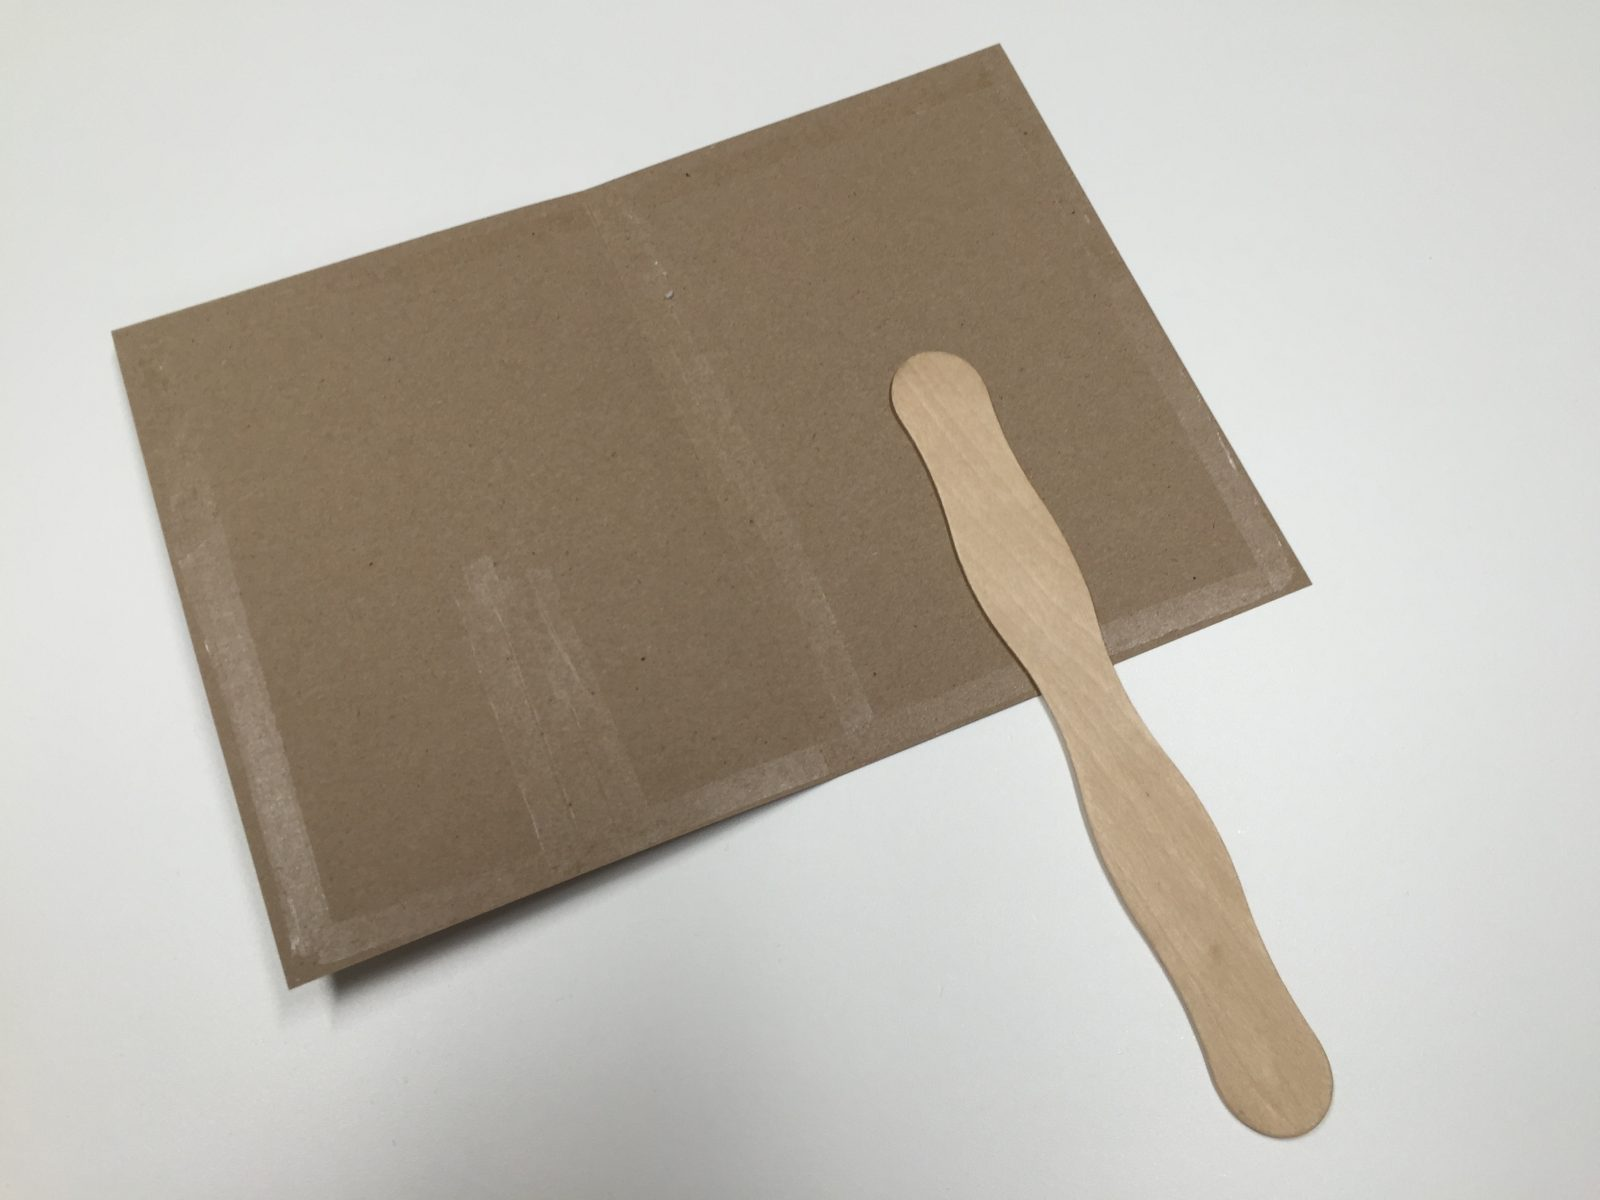 Glue paddle stick